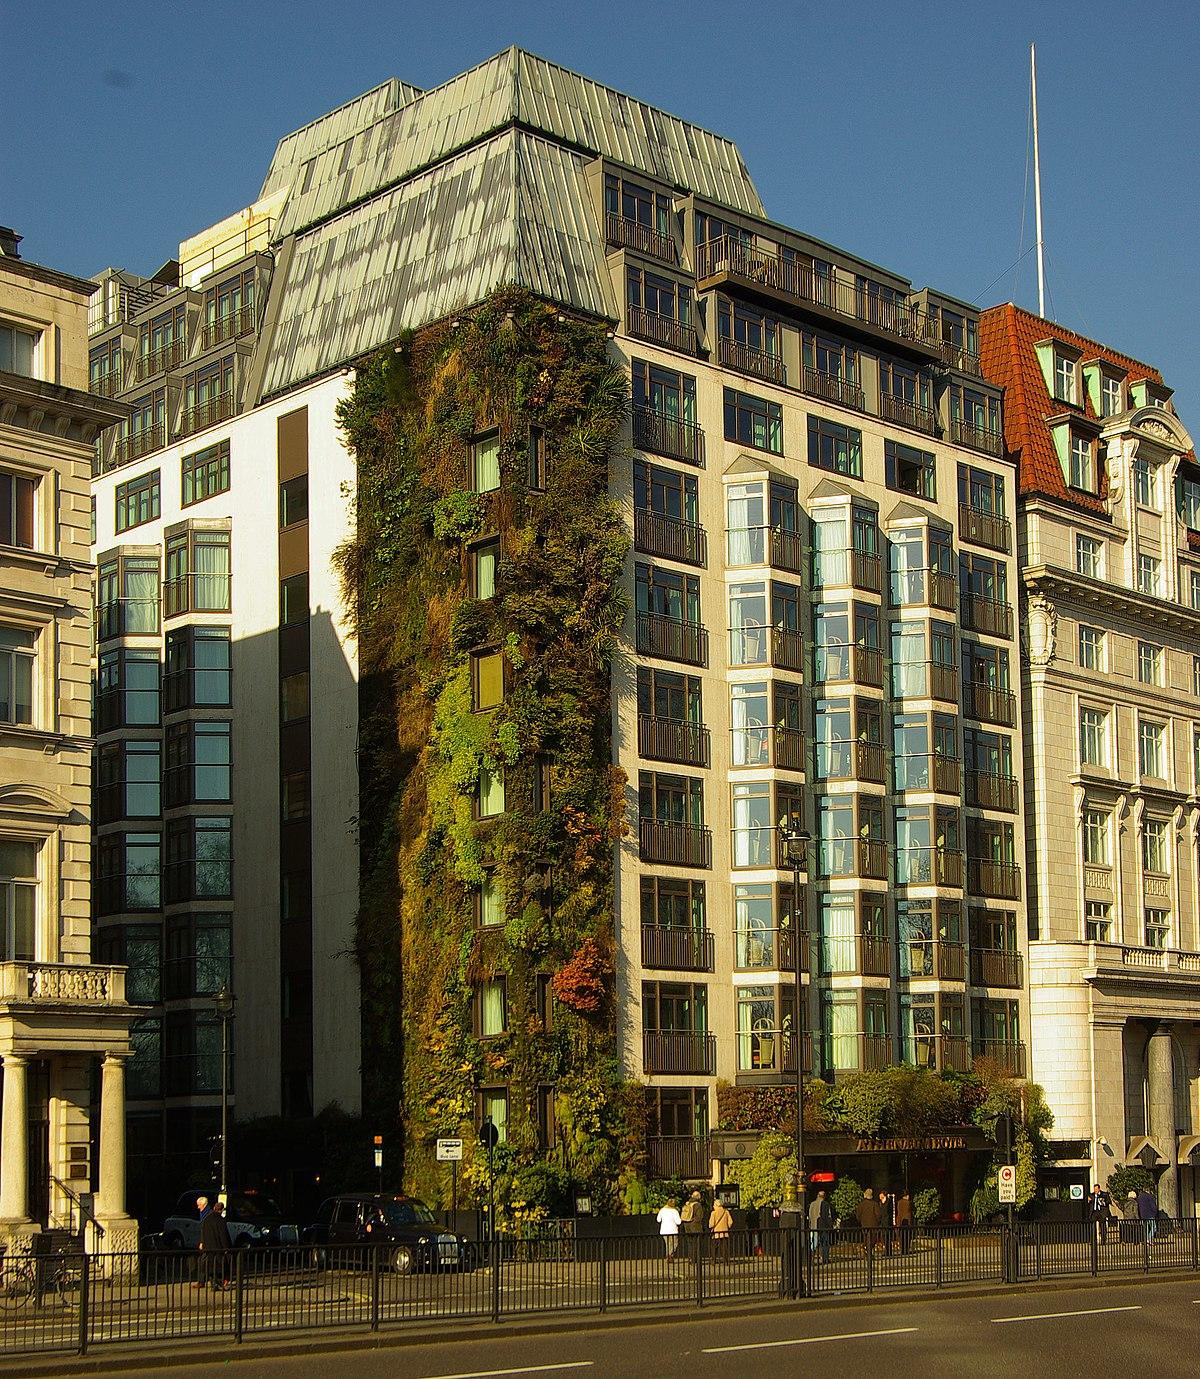 The Athenaeum Hotel - Wikipedia